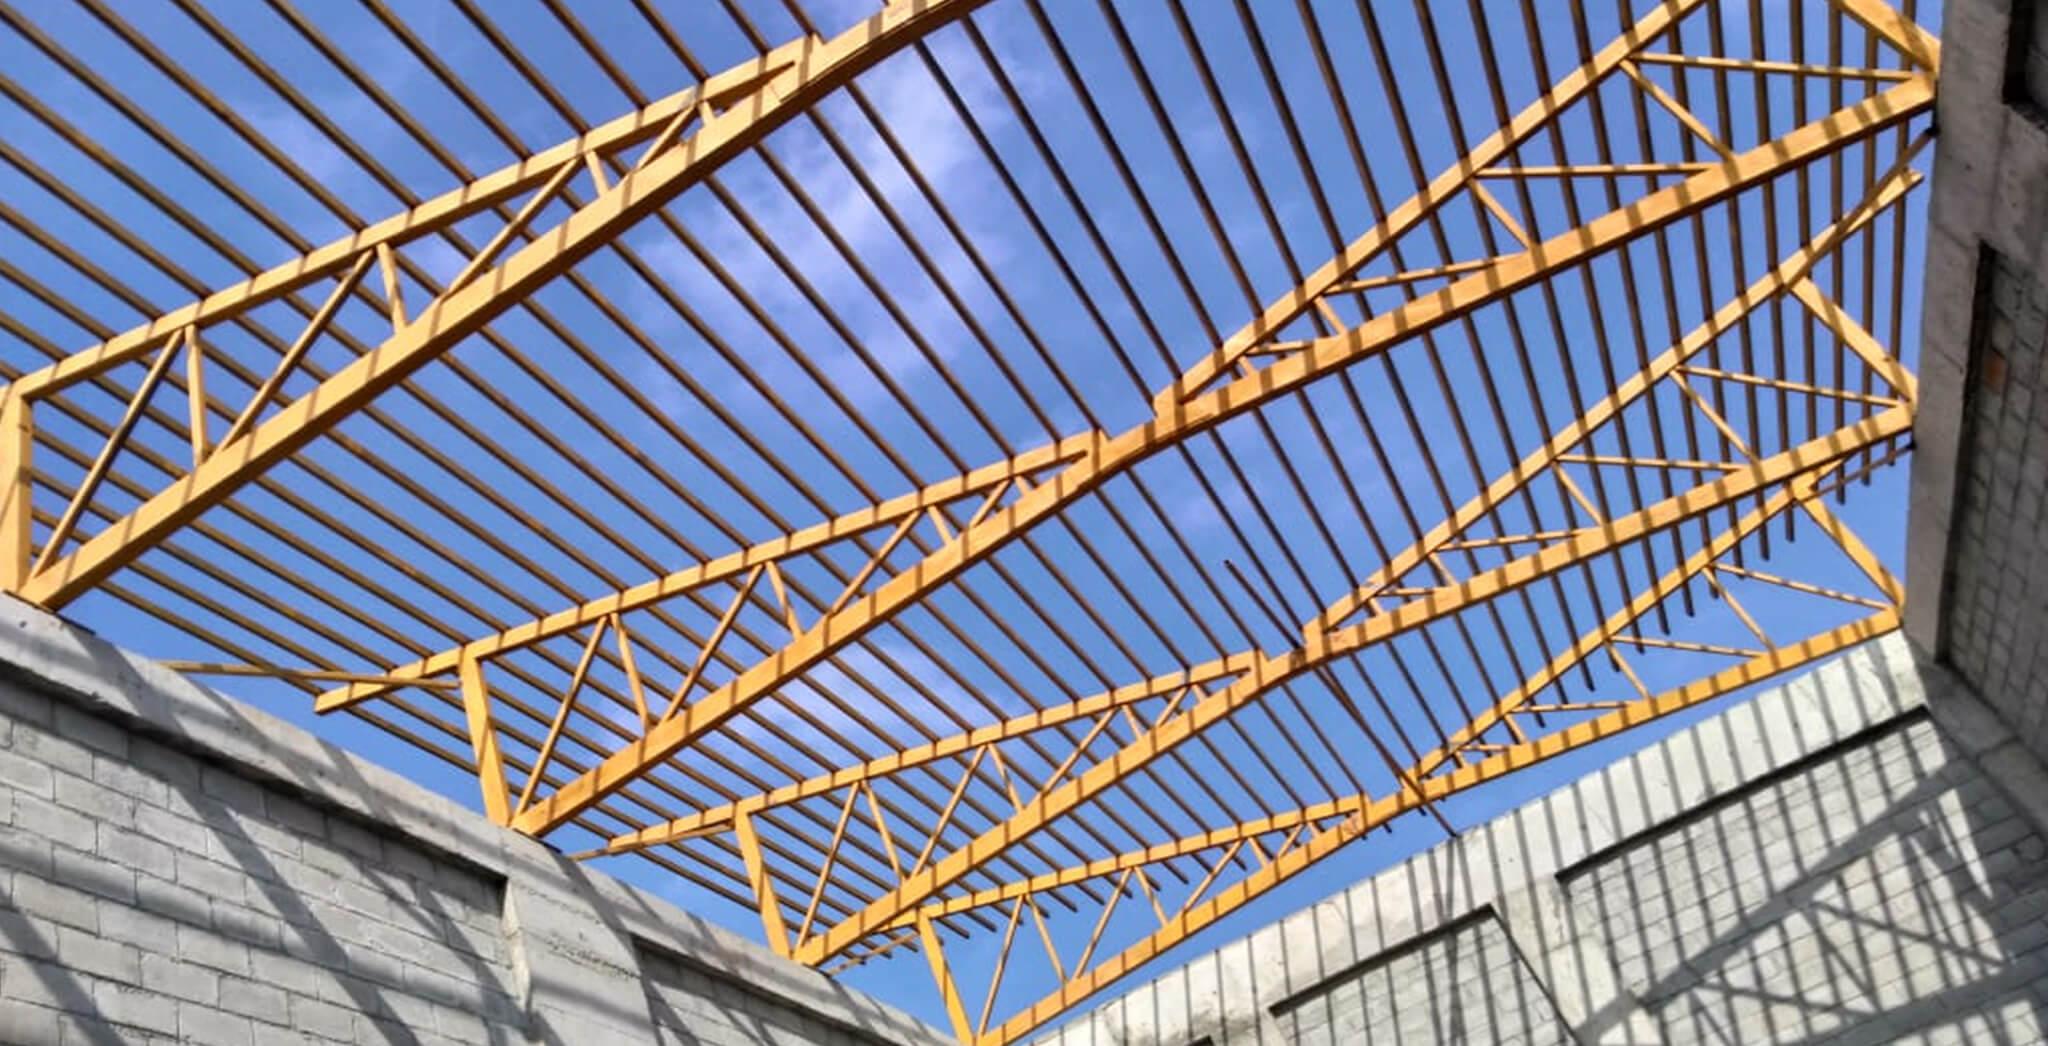 Nov 2018 - Clubhouse—MS Roof truss work-in-progress